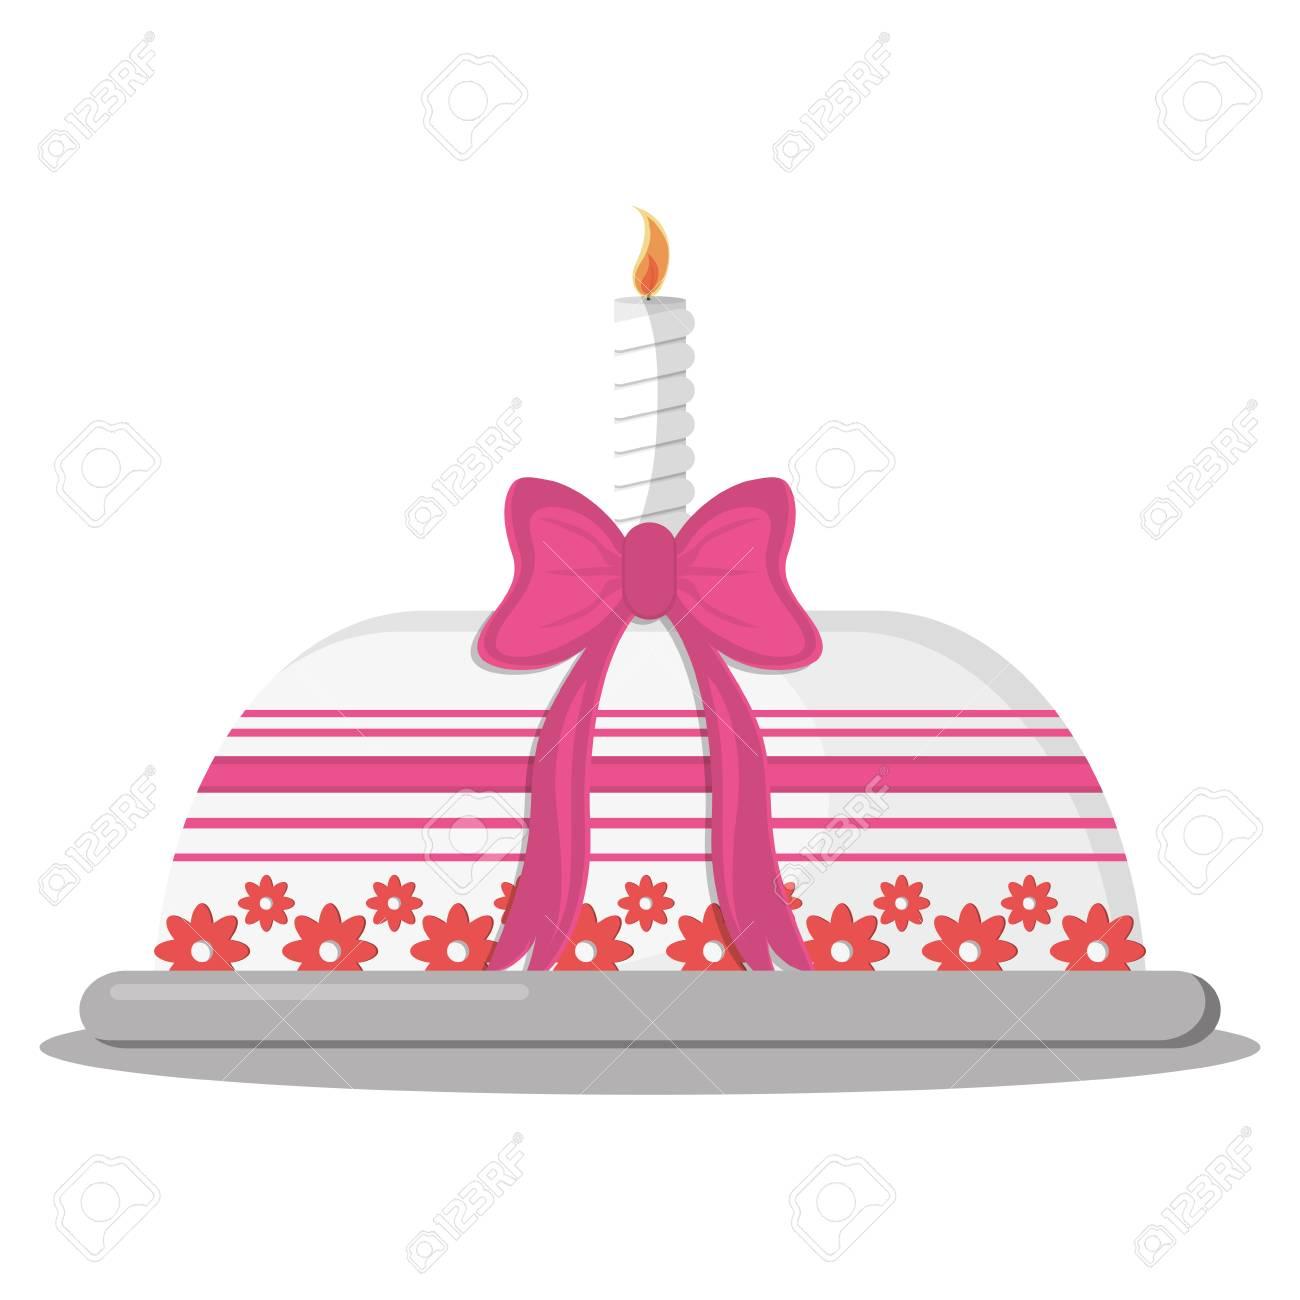 Flat Design Birthday Cake Icon Illustration Royalty Free Cliparts